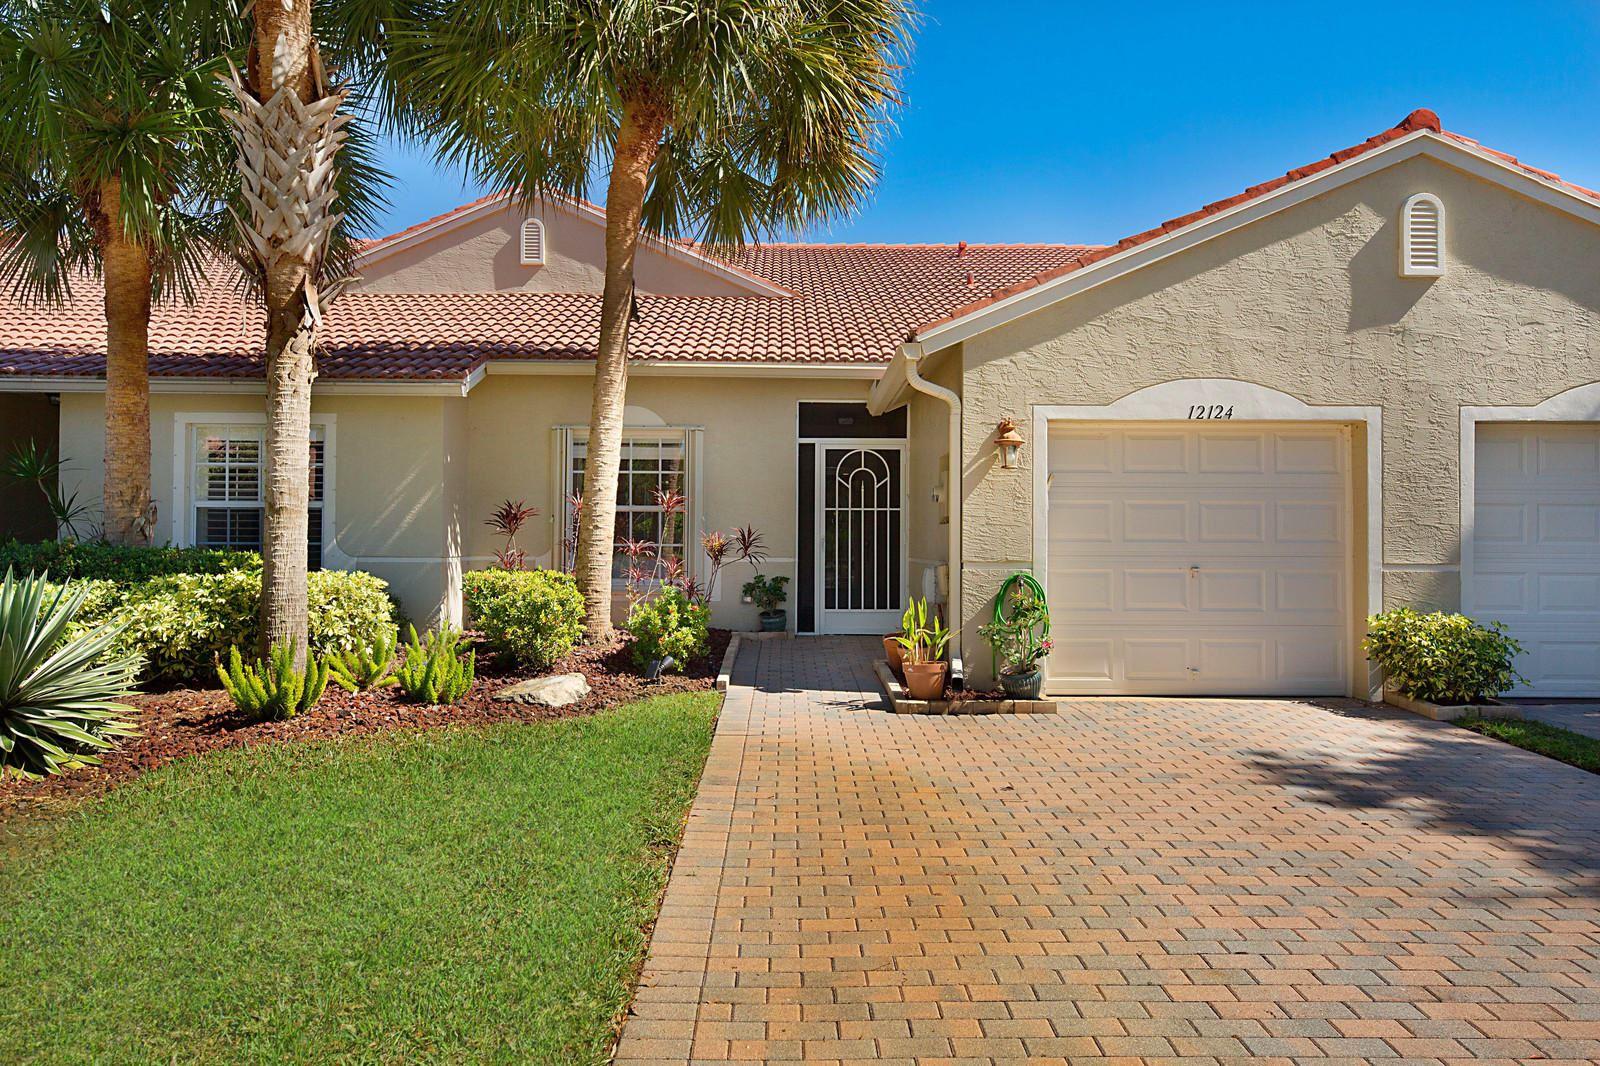 12124 Serafino Street, Boynton Beach, FL 33437 - #: RX-10599119